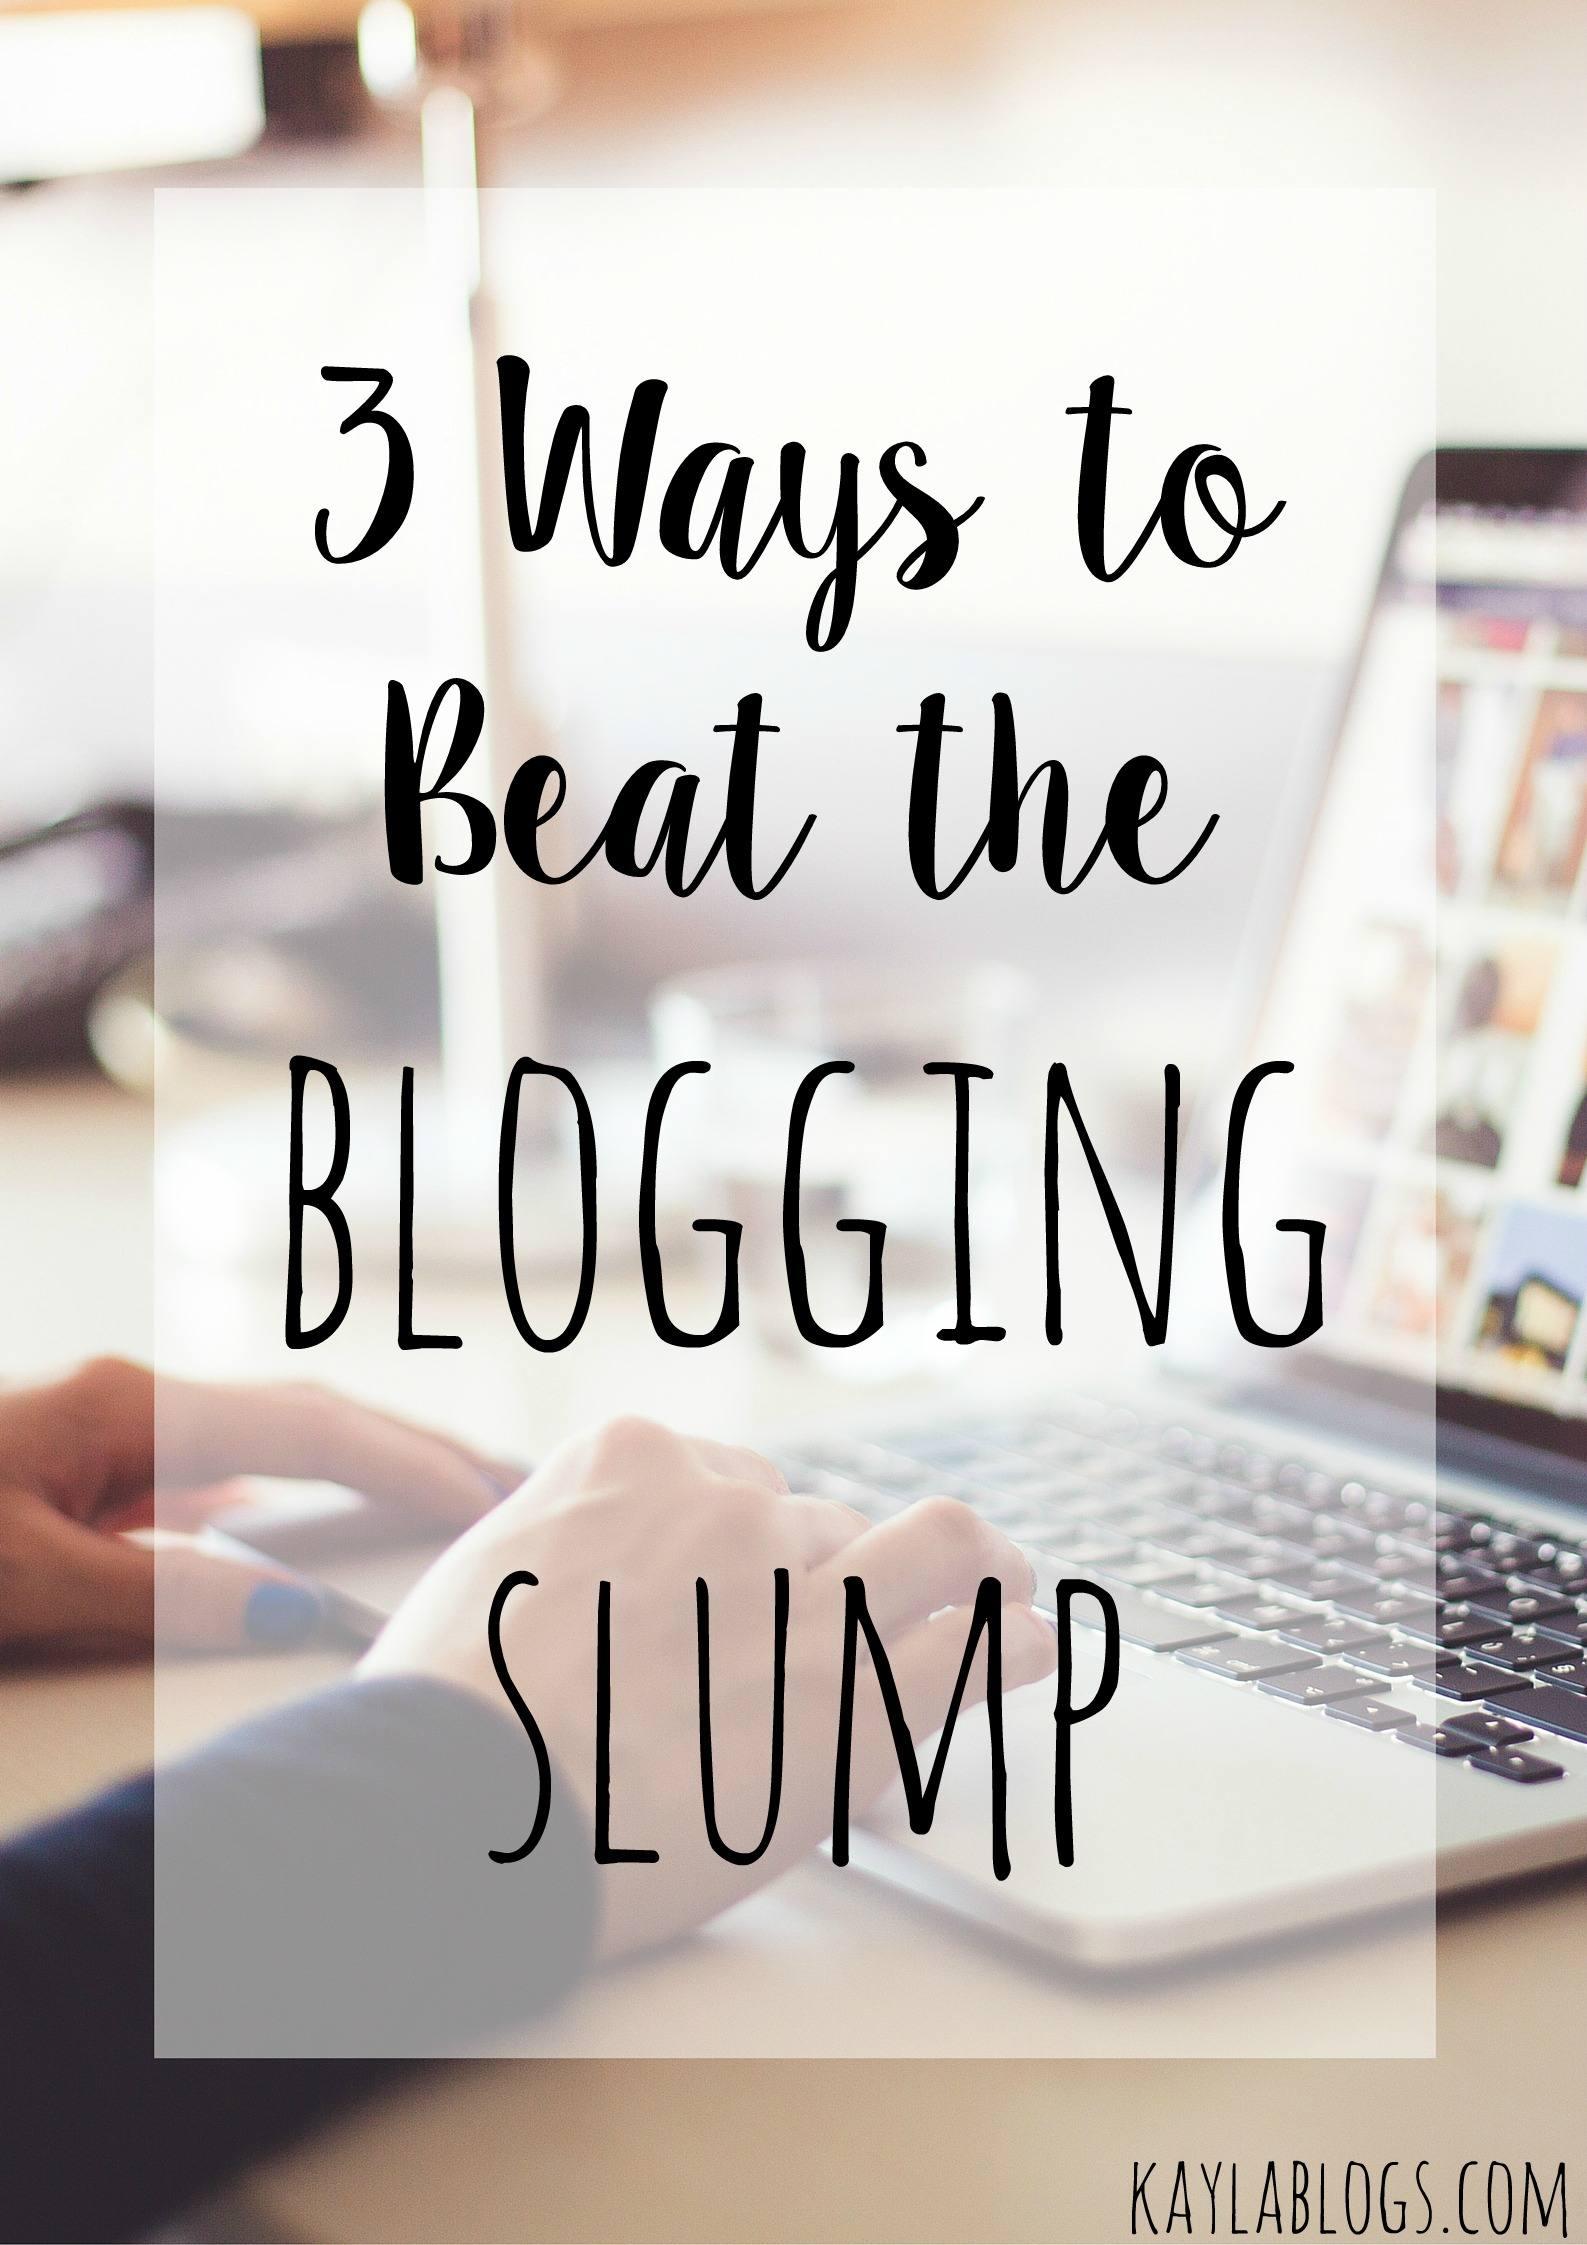 3 Ways to Beat the Blogging Slump